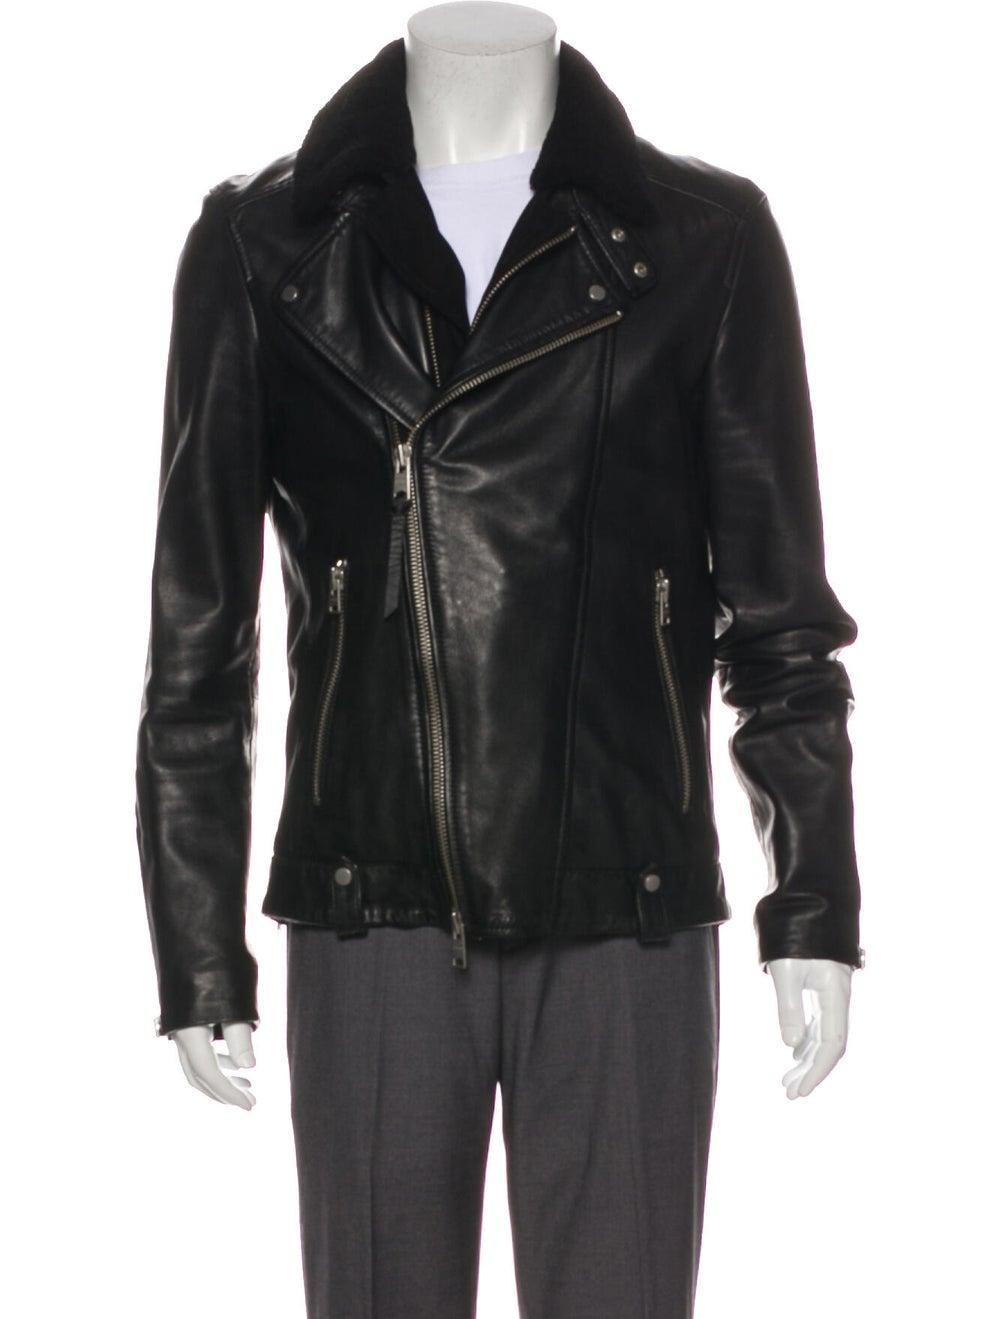 AllSaints Prospect Leather Moto Jacket Black - image 4